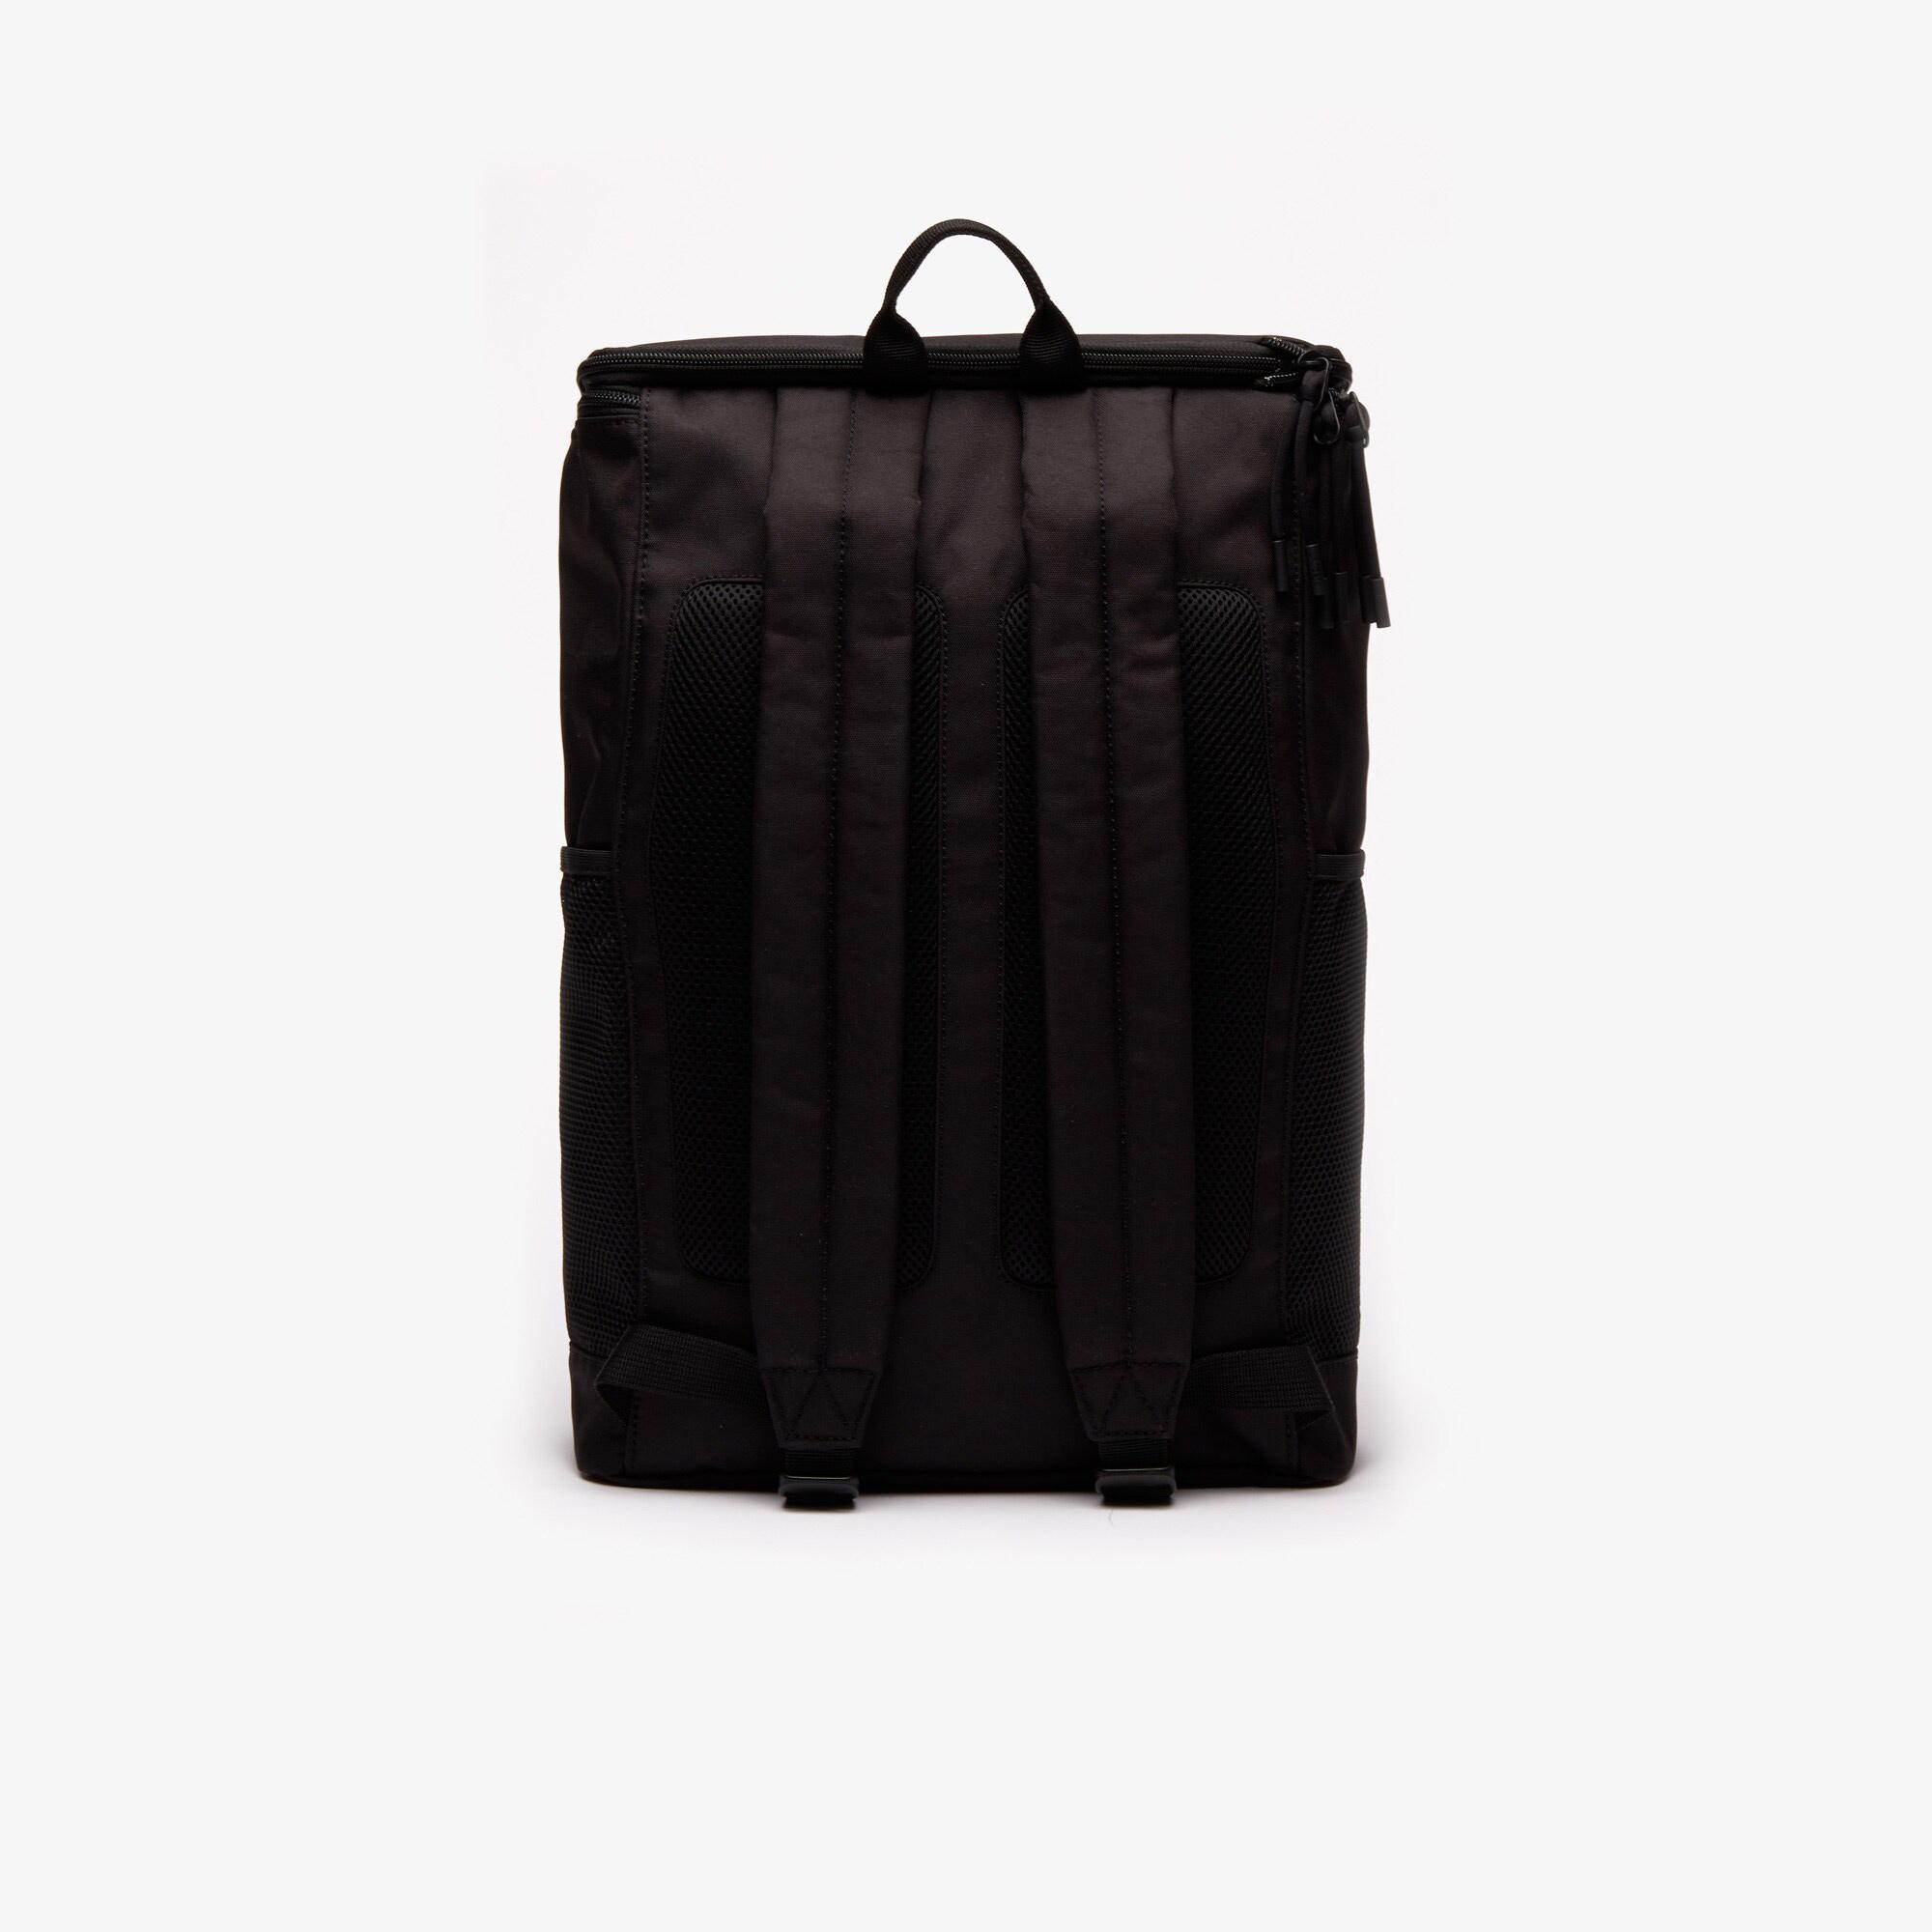 Lacoste рюкзак чоловічий Infini-T Solar Charger